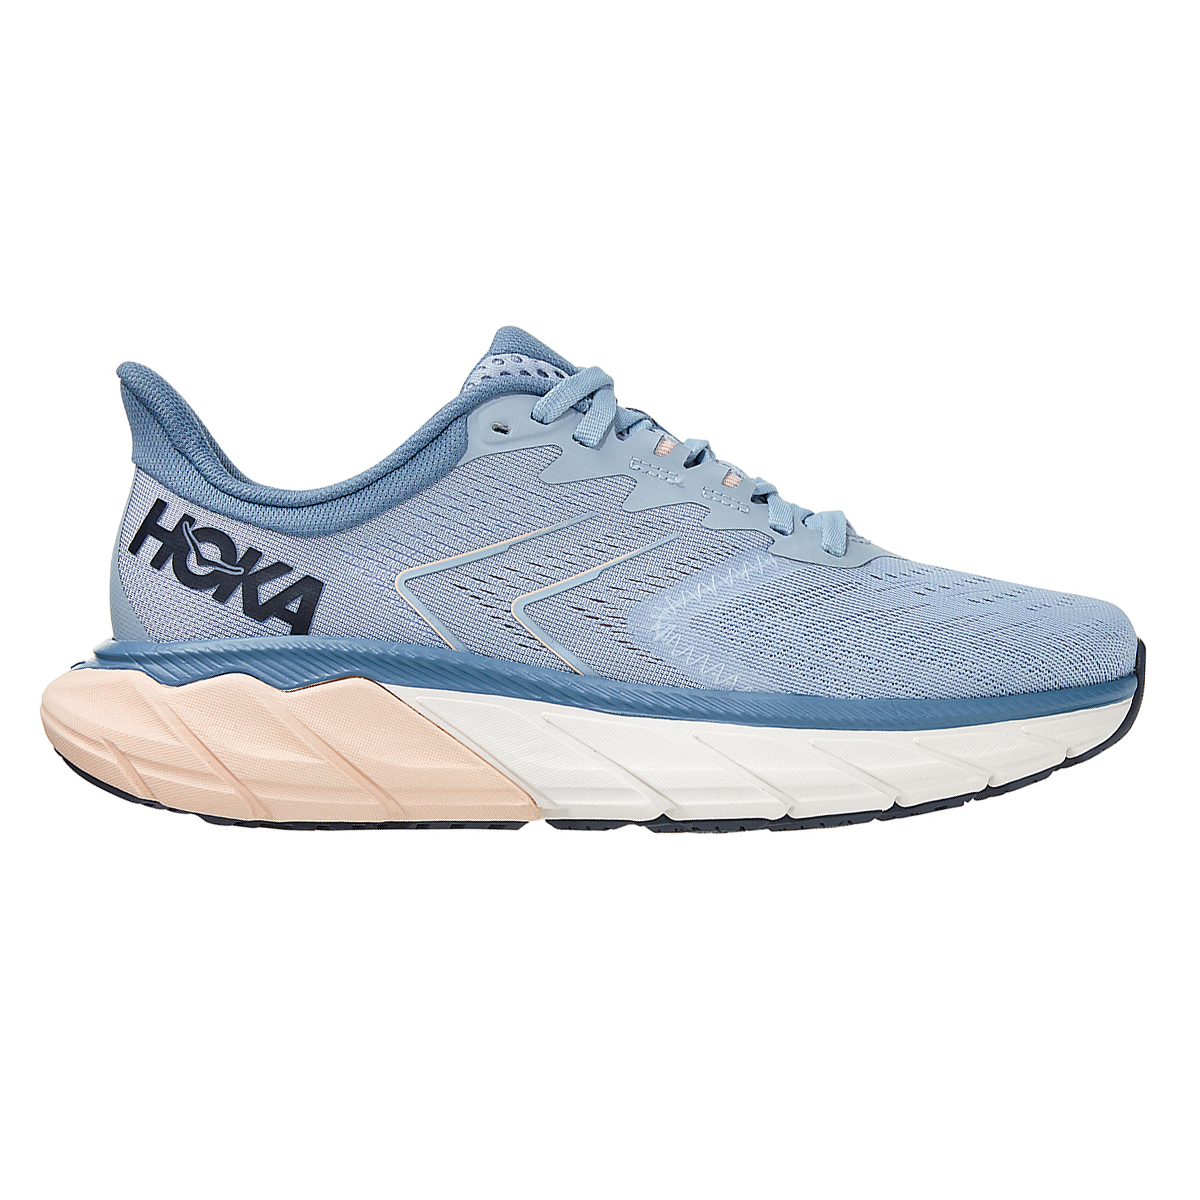 Women's Hoka One One Arahi 5 Running Shoe - Color: Blue Fog/Provincial Blue - Size: 5 - Width: Regular, Blue Fog/Provincial Blue, large, image 1